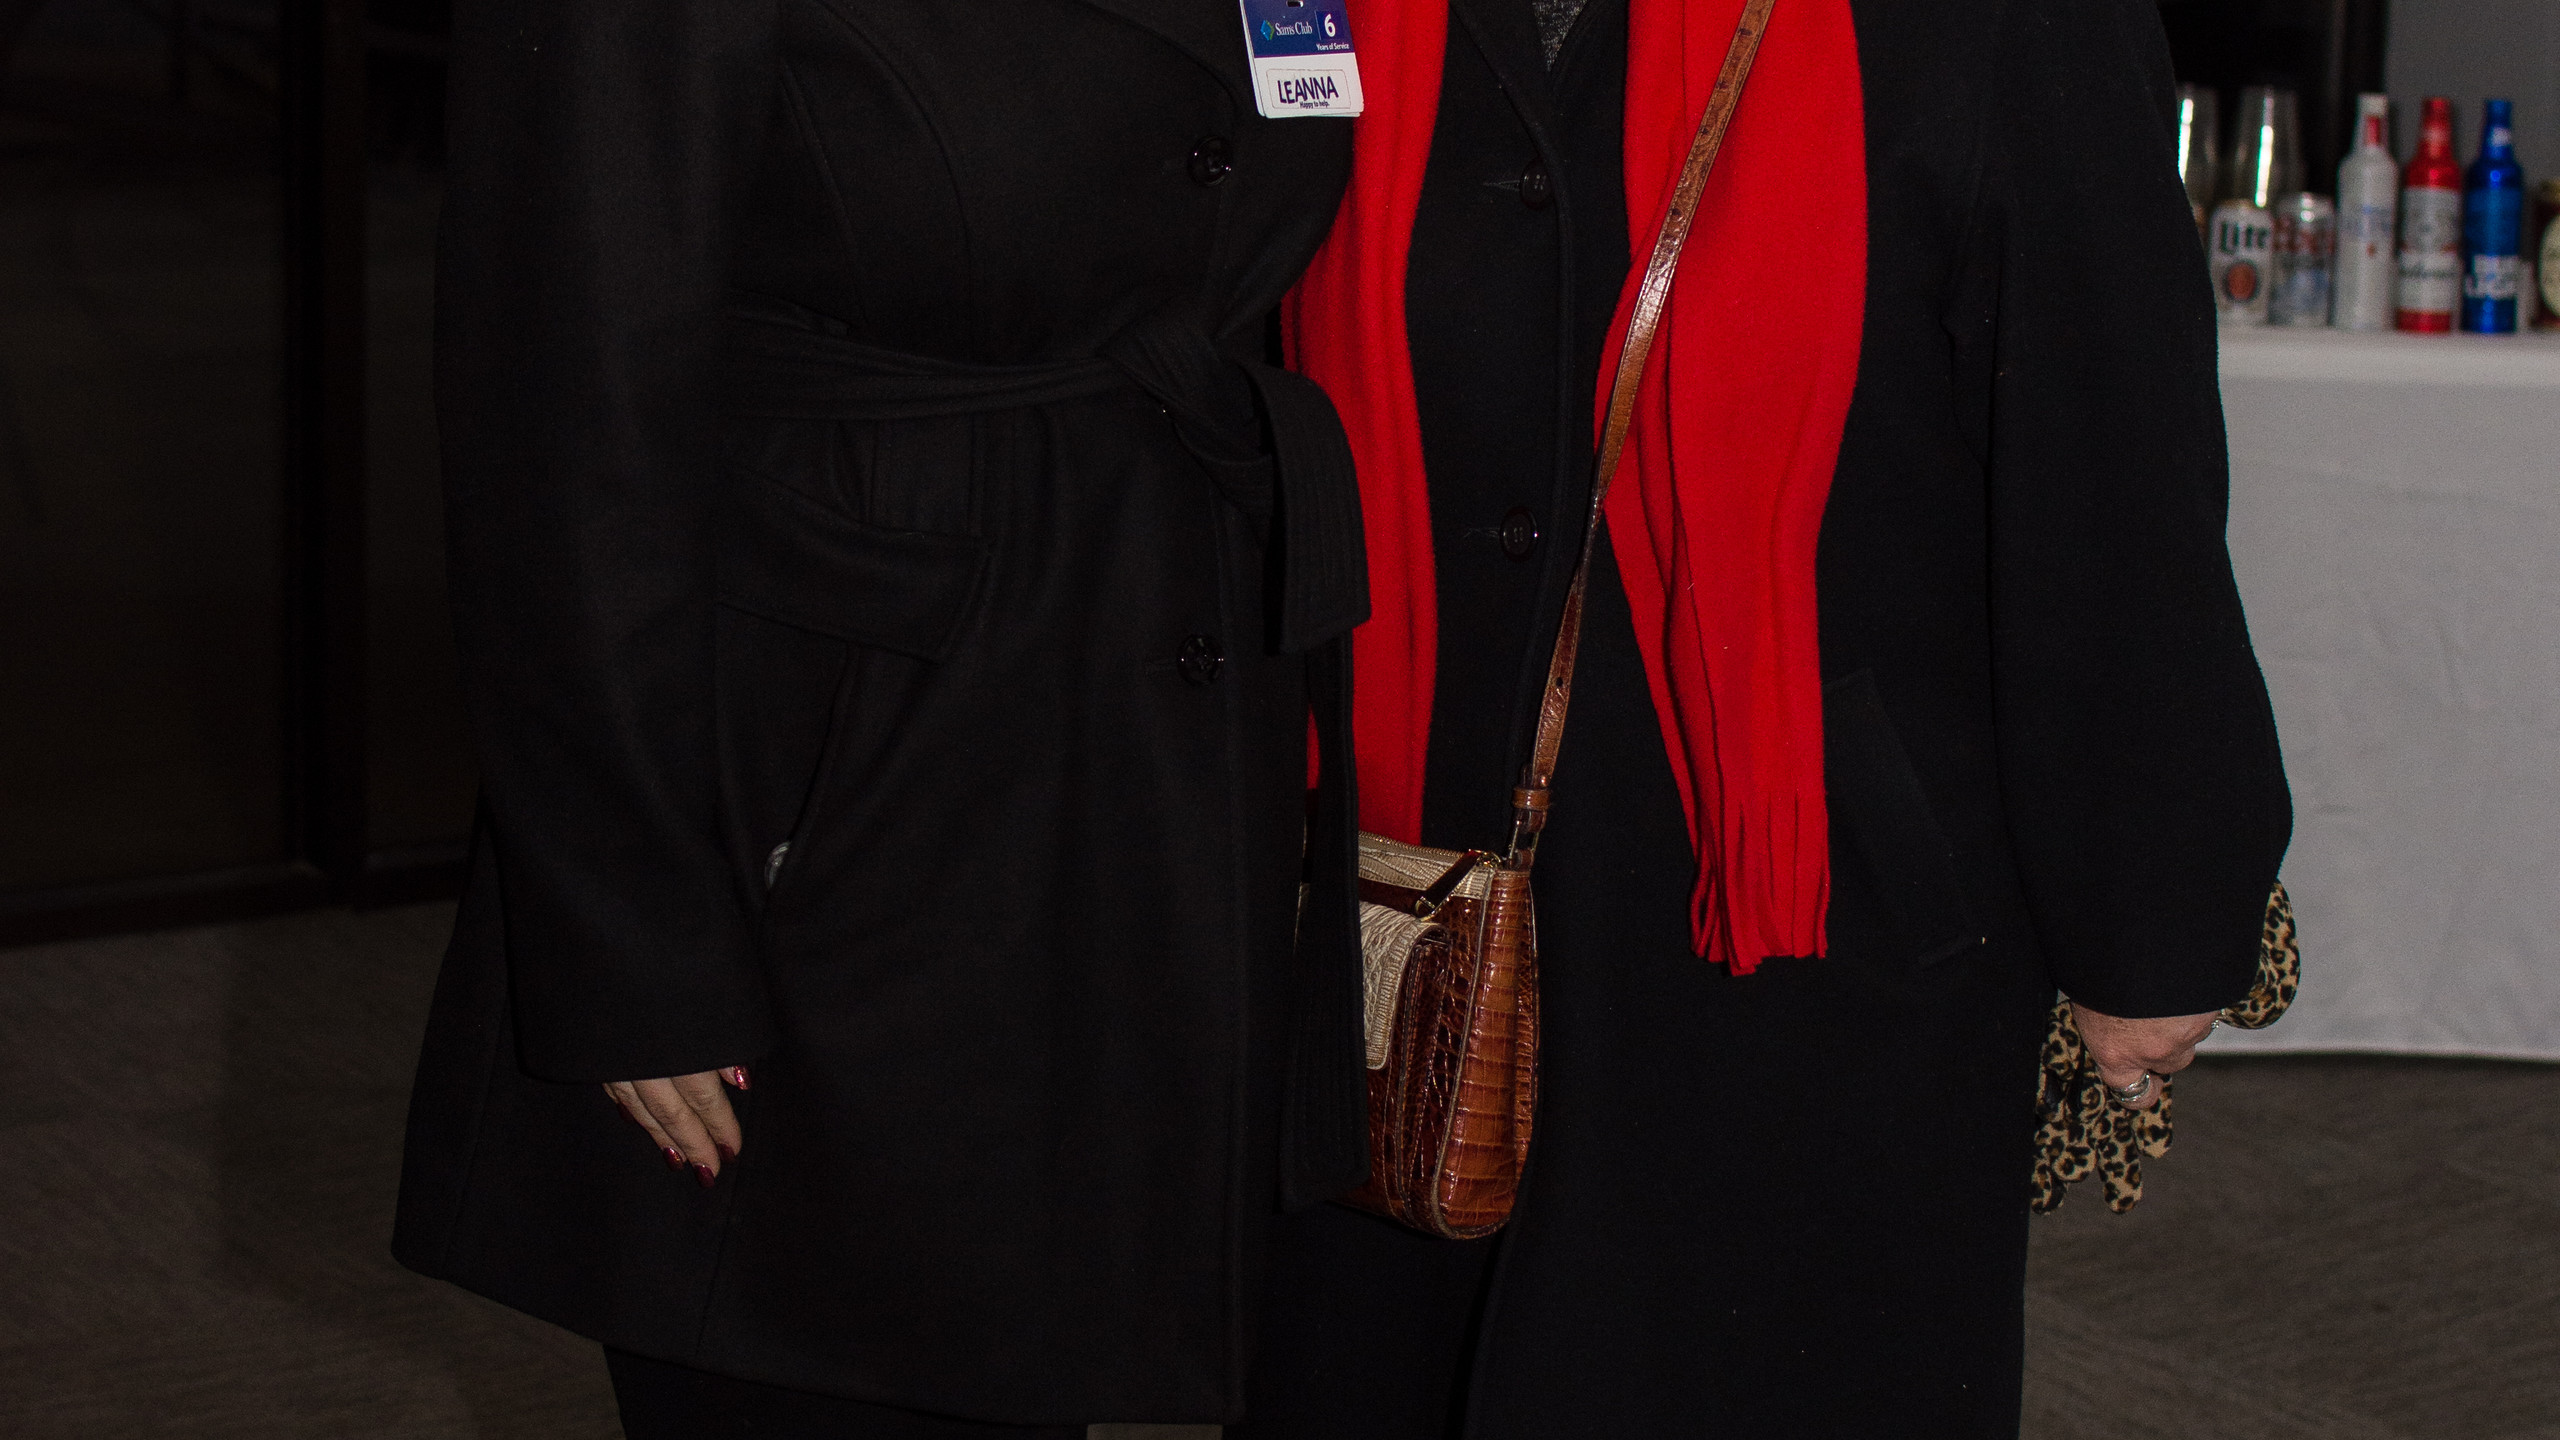 Leanna Buckworth and lesa Rogowitz